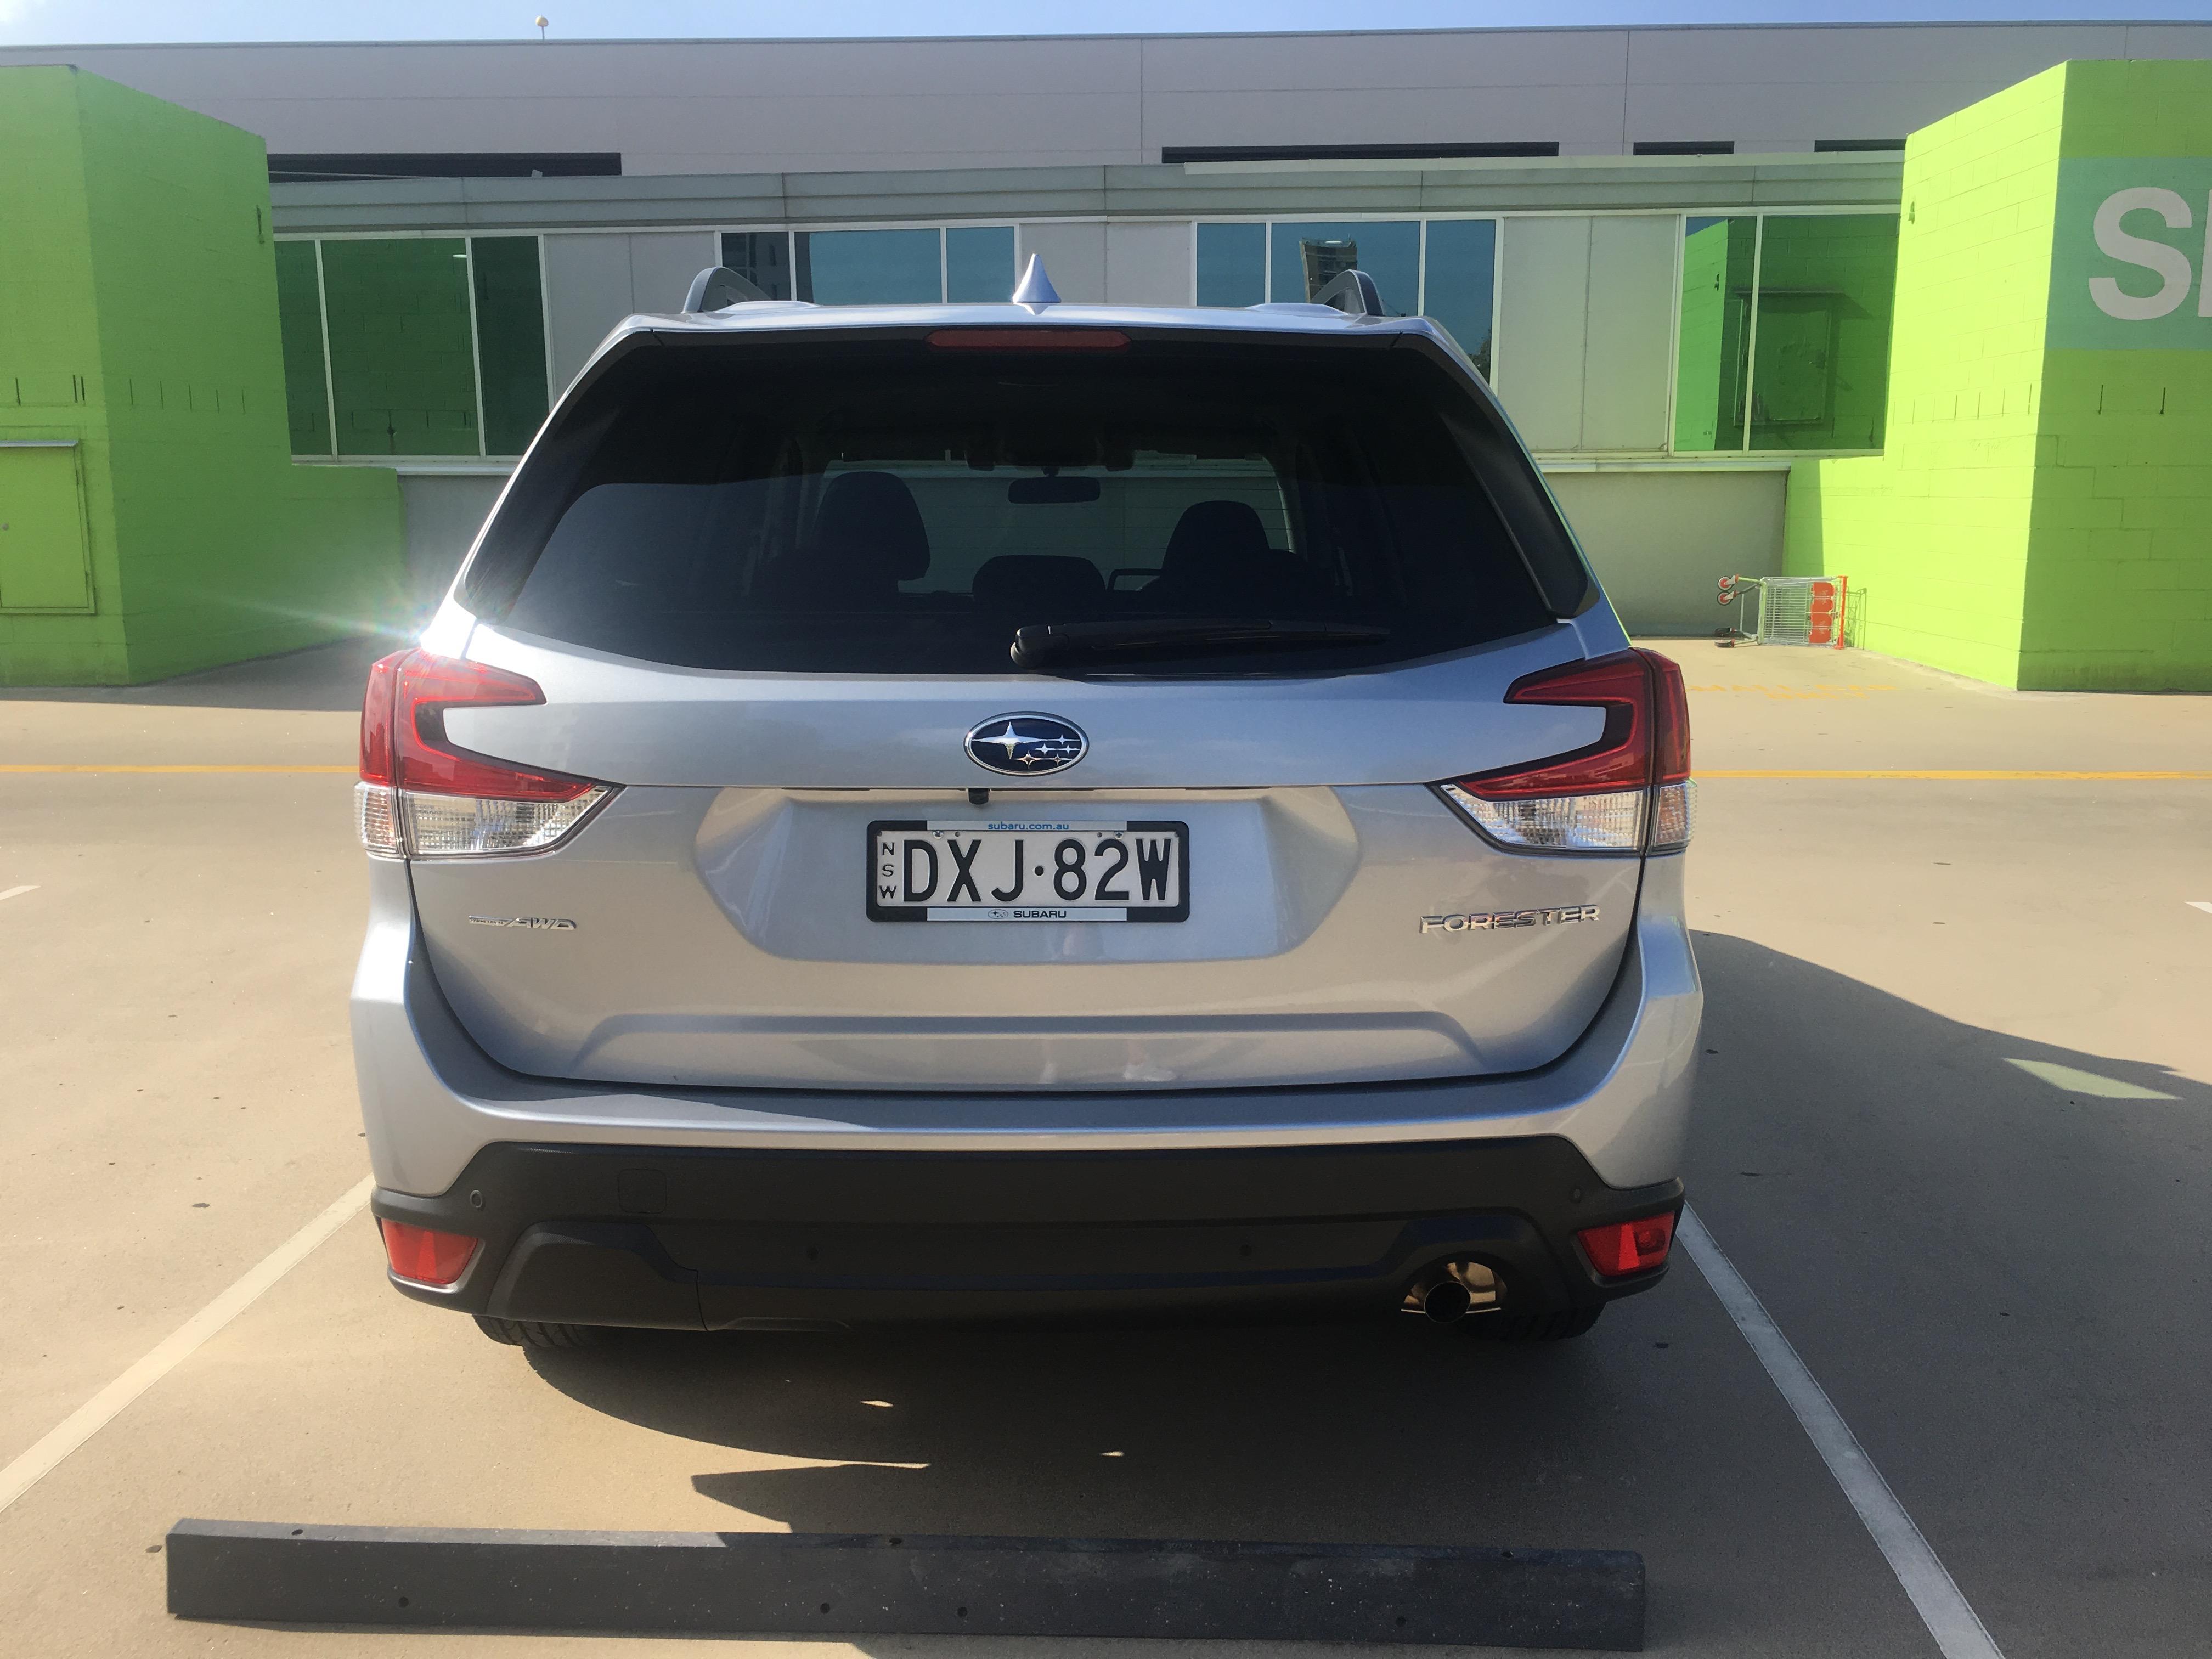 试驾斯巴鲁森林人——Subaru Forester 2019